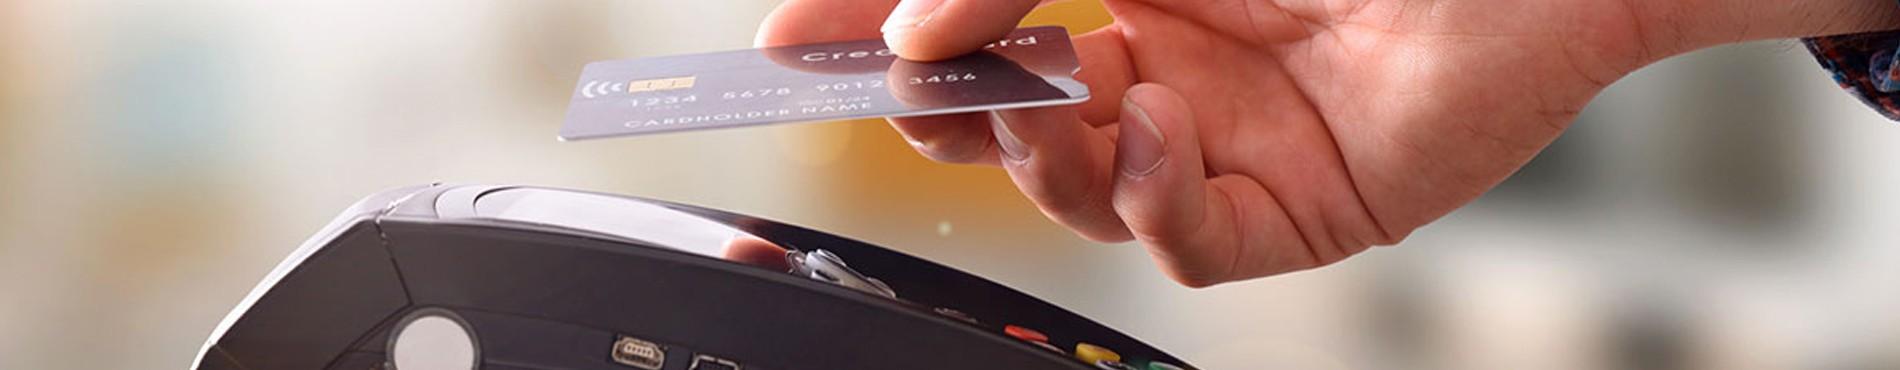 Etuis anti-RFID Publicitaires Personnalisés